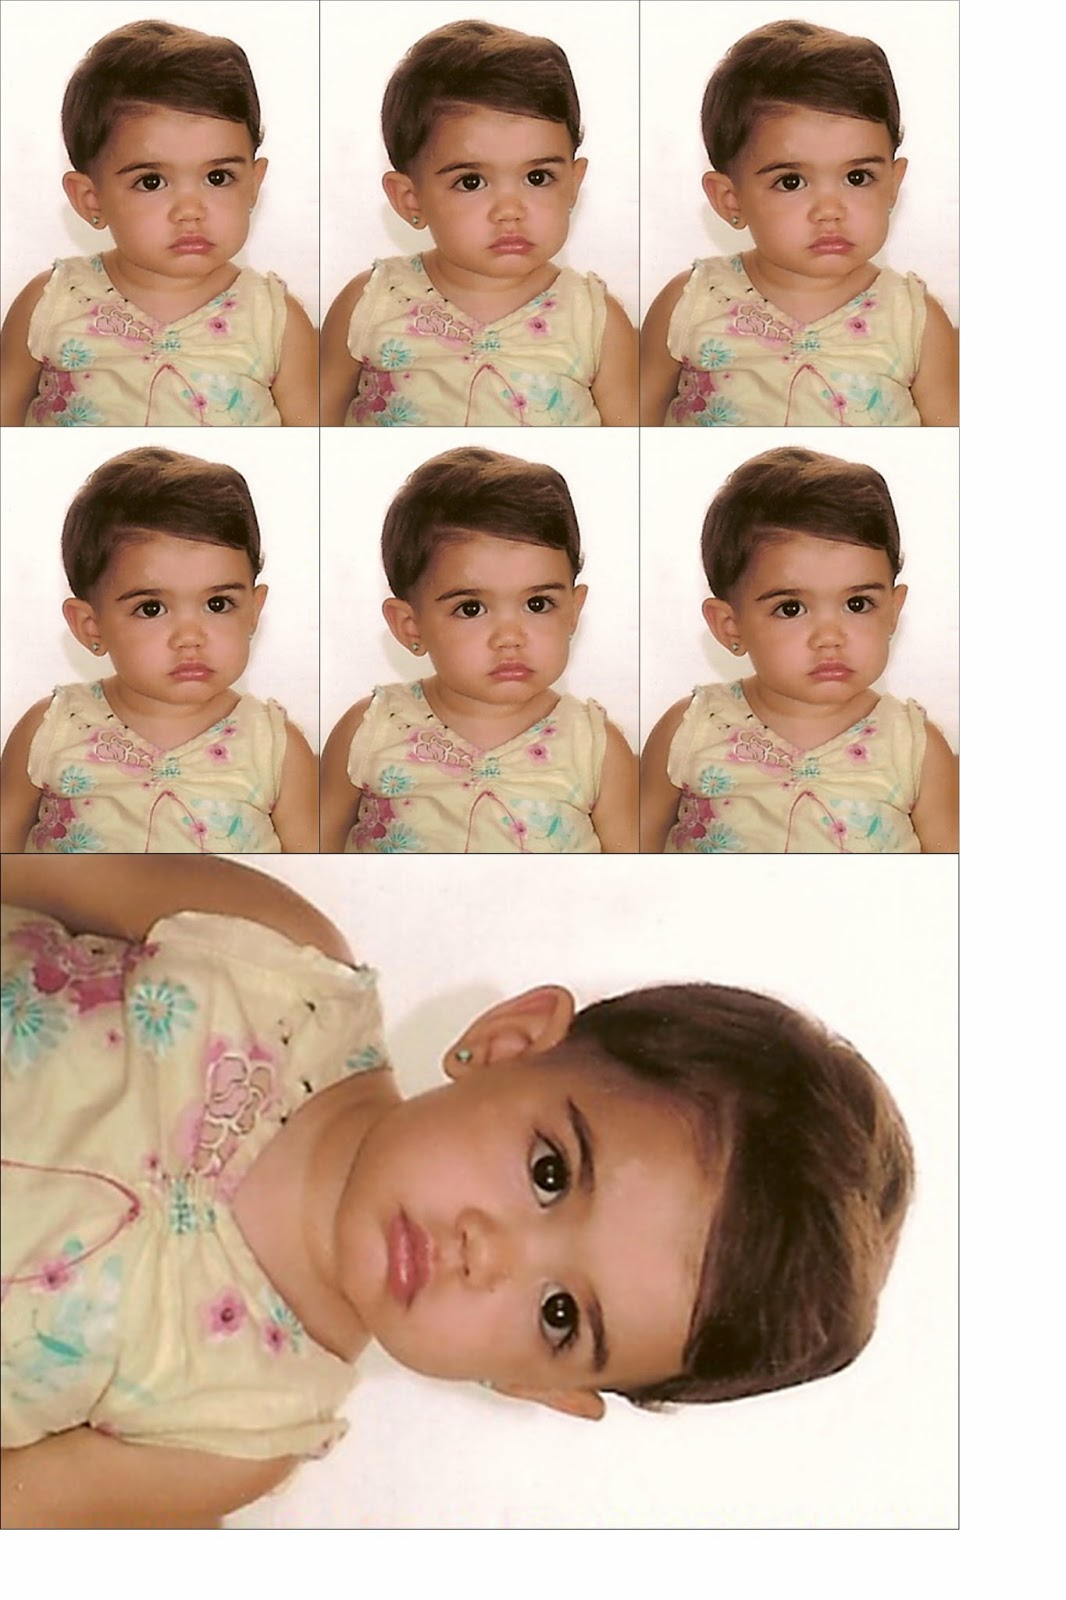 Aprendo Photoshop Foto Carnet Y Postal